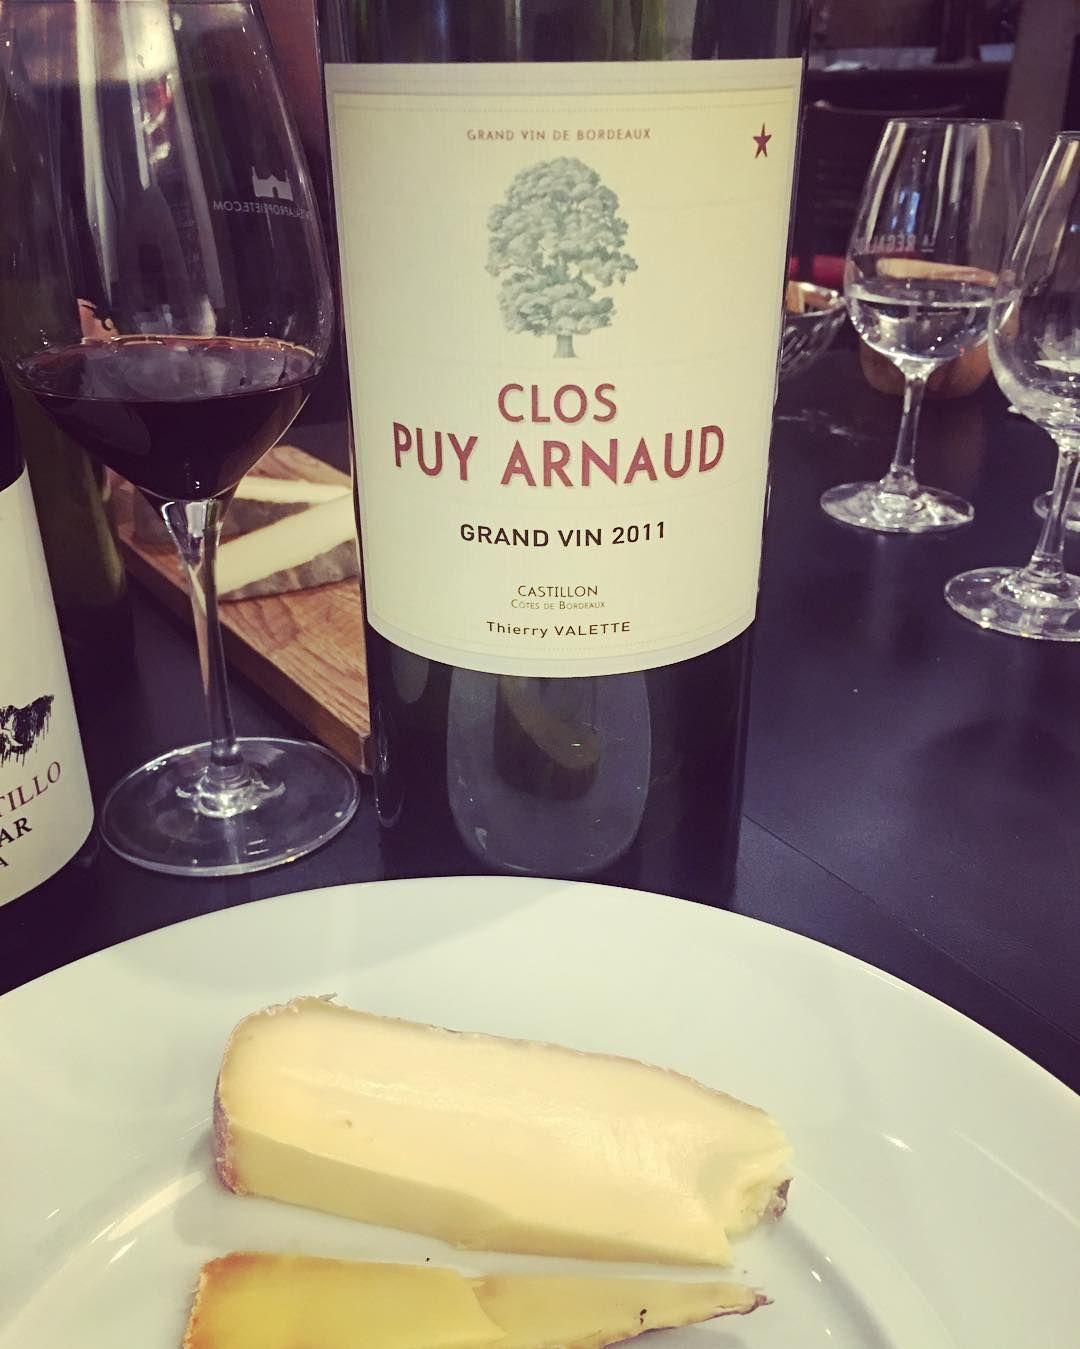 #castillon #clospuyarnaud  #saintnectaire  #vin #wine #wein #vino #vinho #dégustation #winelover #Vineyard #winetasting #instawine #frenchwine #instavinho  #instadrink  #wineblog  #lifestyle #vigne #vines  #vignoble #Paris #France #bio  #beaugrandvins